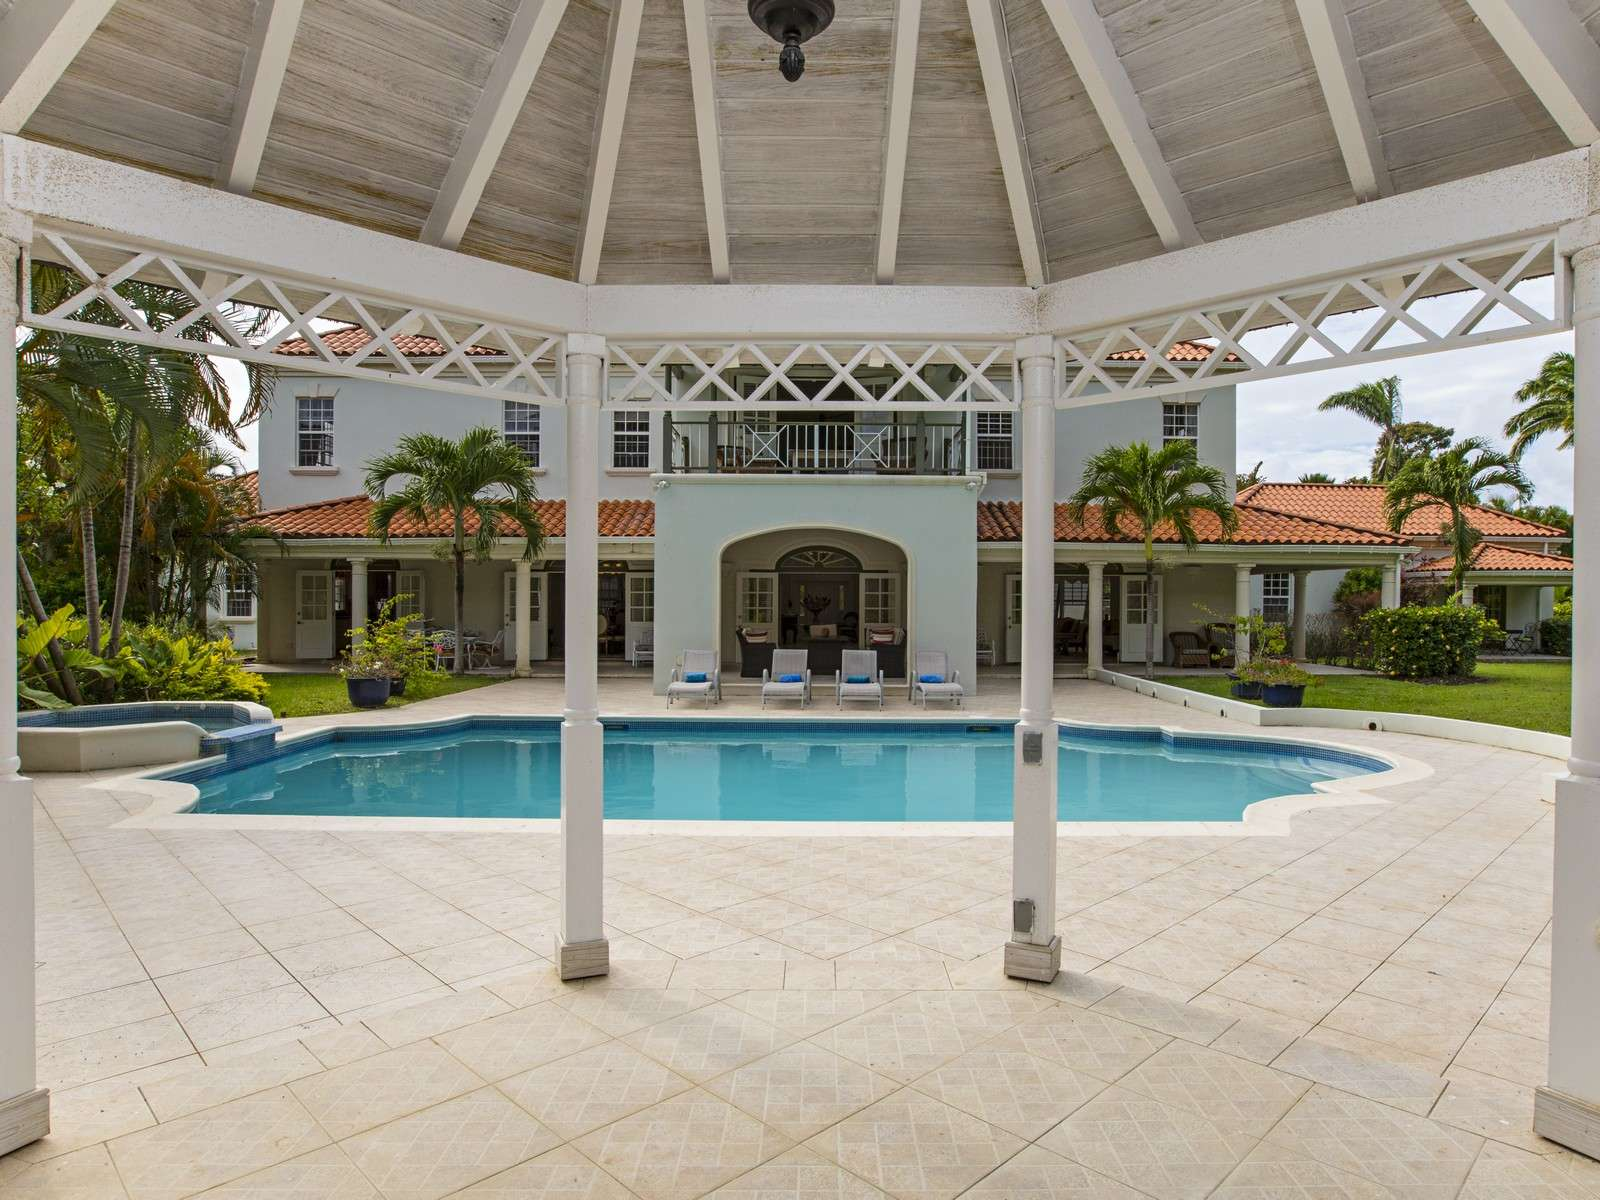 Luxury villa rentals caribbean - Barbados - St james - Sandy laneestate - Magnolia - Image 1/22